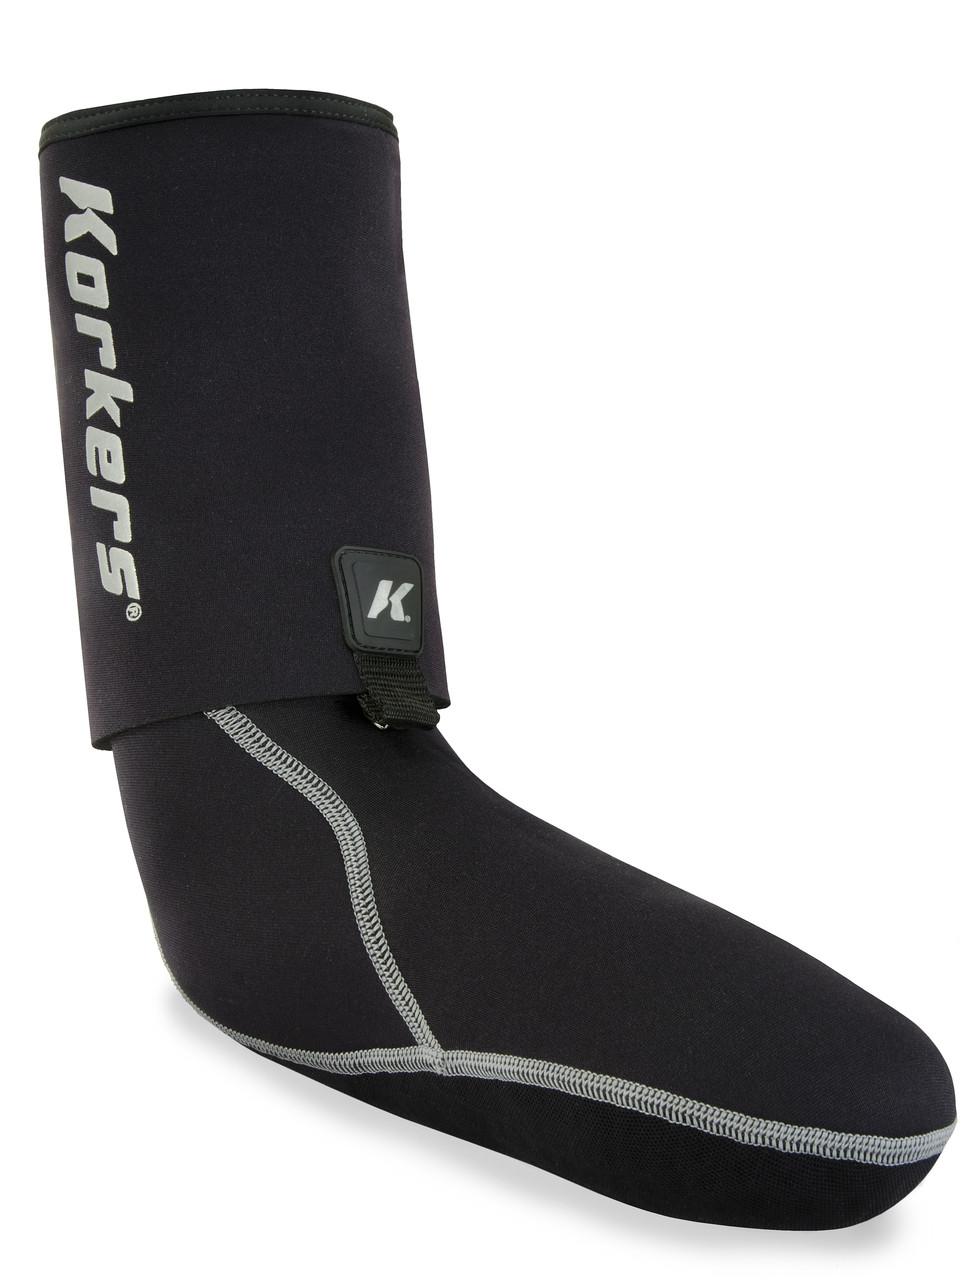 Korkers I-DRAIN Neoprene Guard Socks 3.5MM Large (Sizes 11-12)